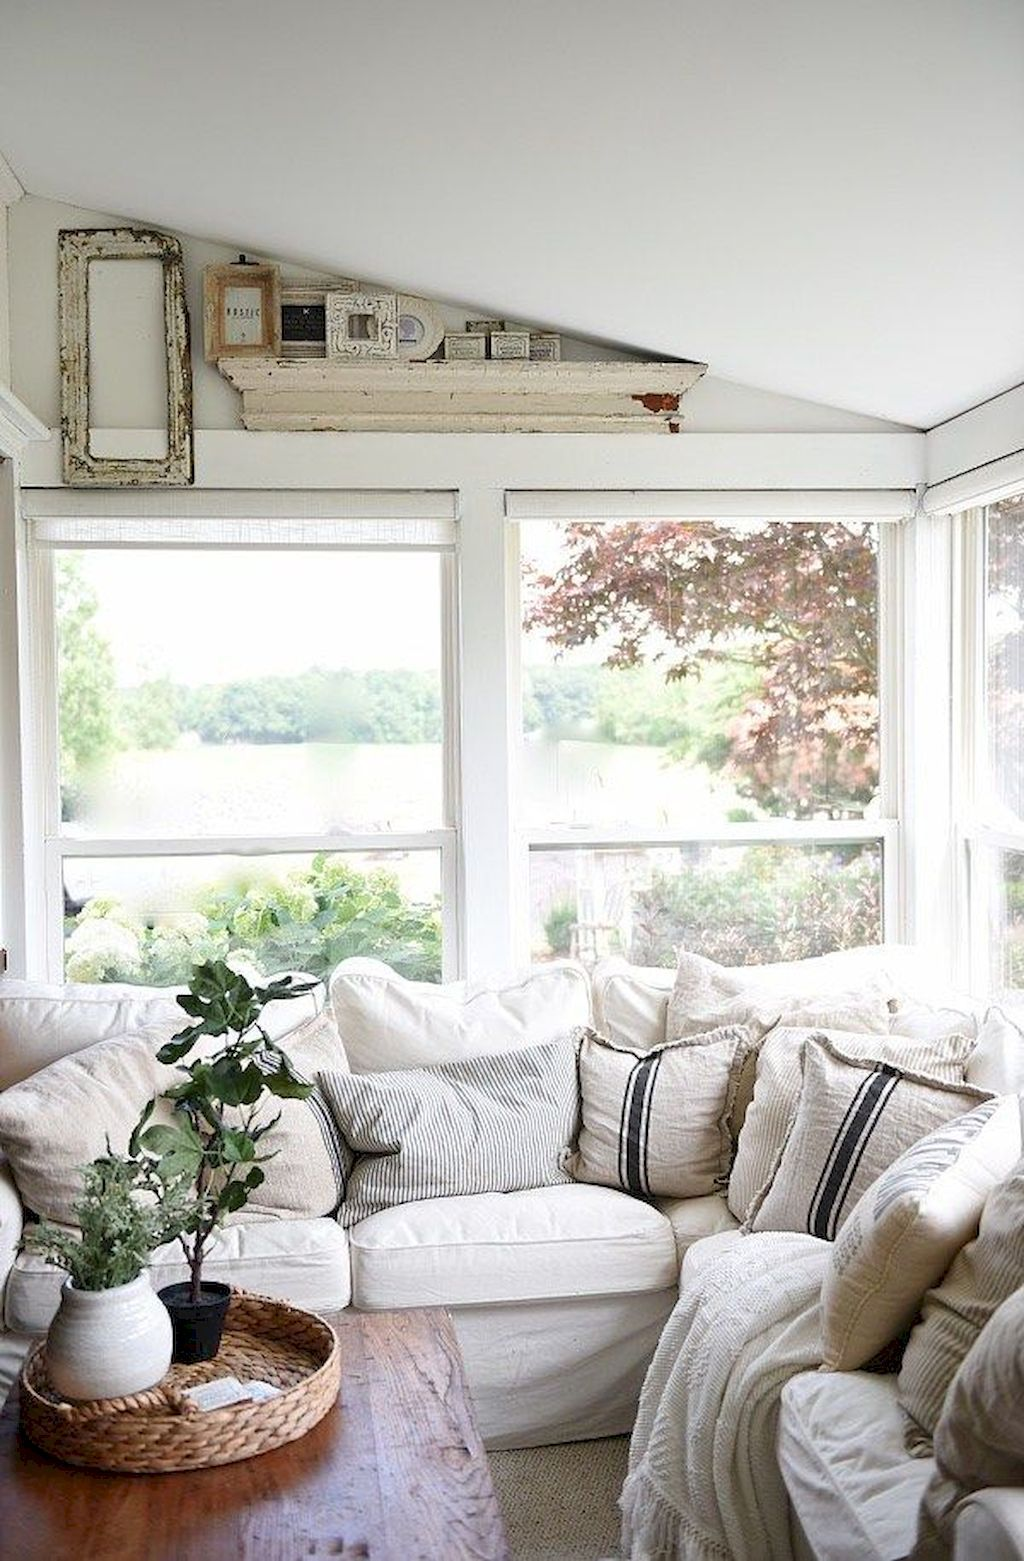 Attractive Gorgeous 75 Cozy Modern Farmhouse Sunroom Decor Ideas Https://rusticroom.co/